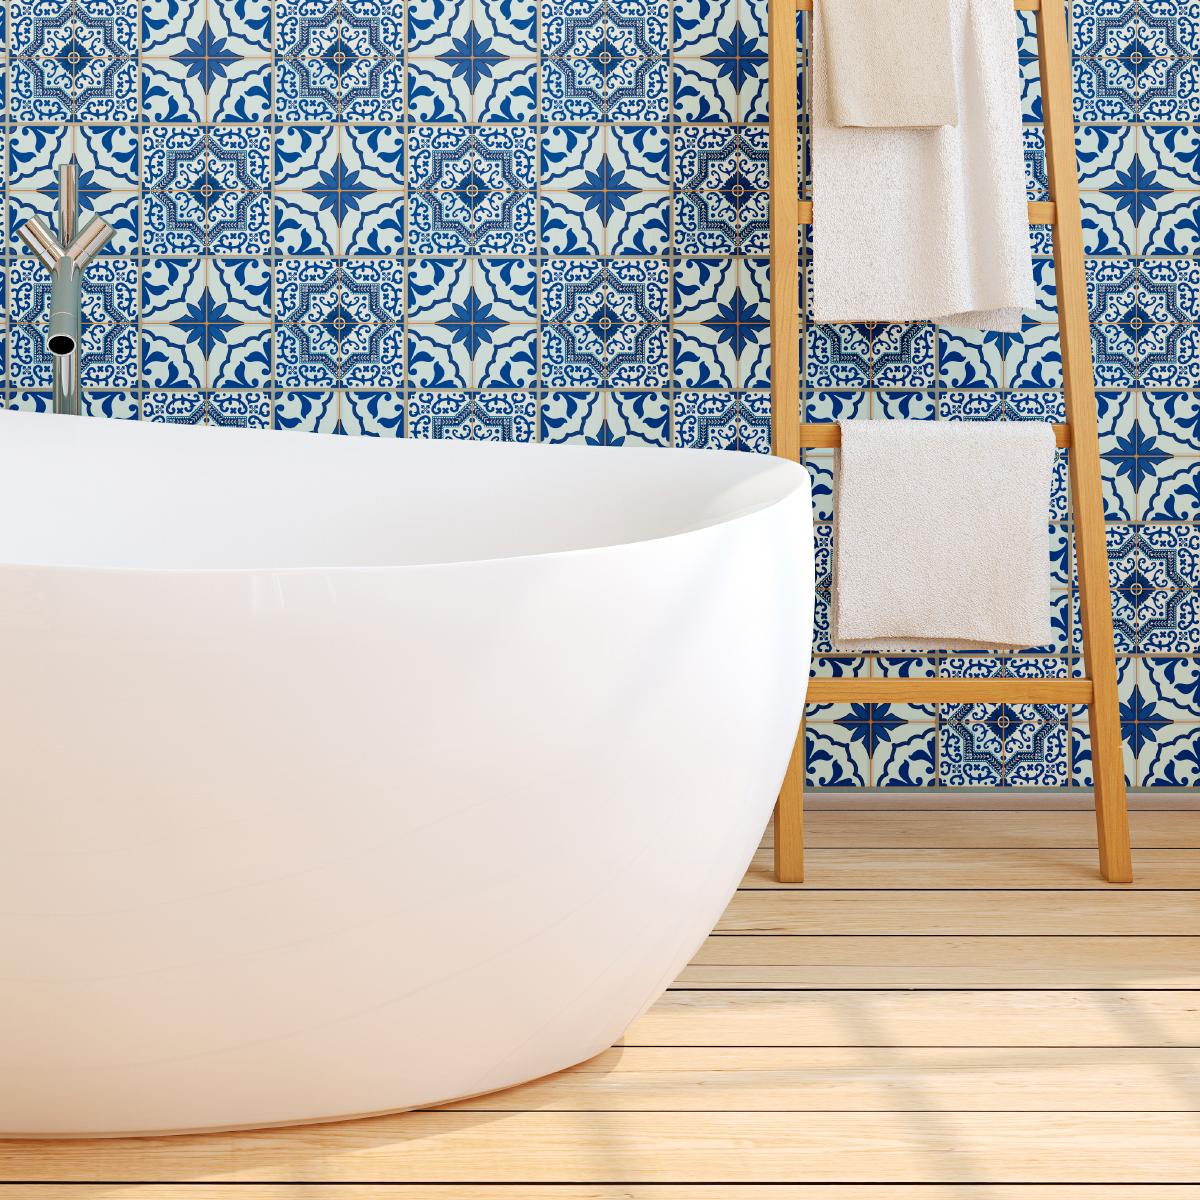 60 stickers carrelages azulejos facundo salle de bain et. Black Bedroom Furniture Sets. Home Design Ideas